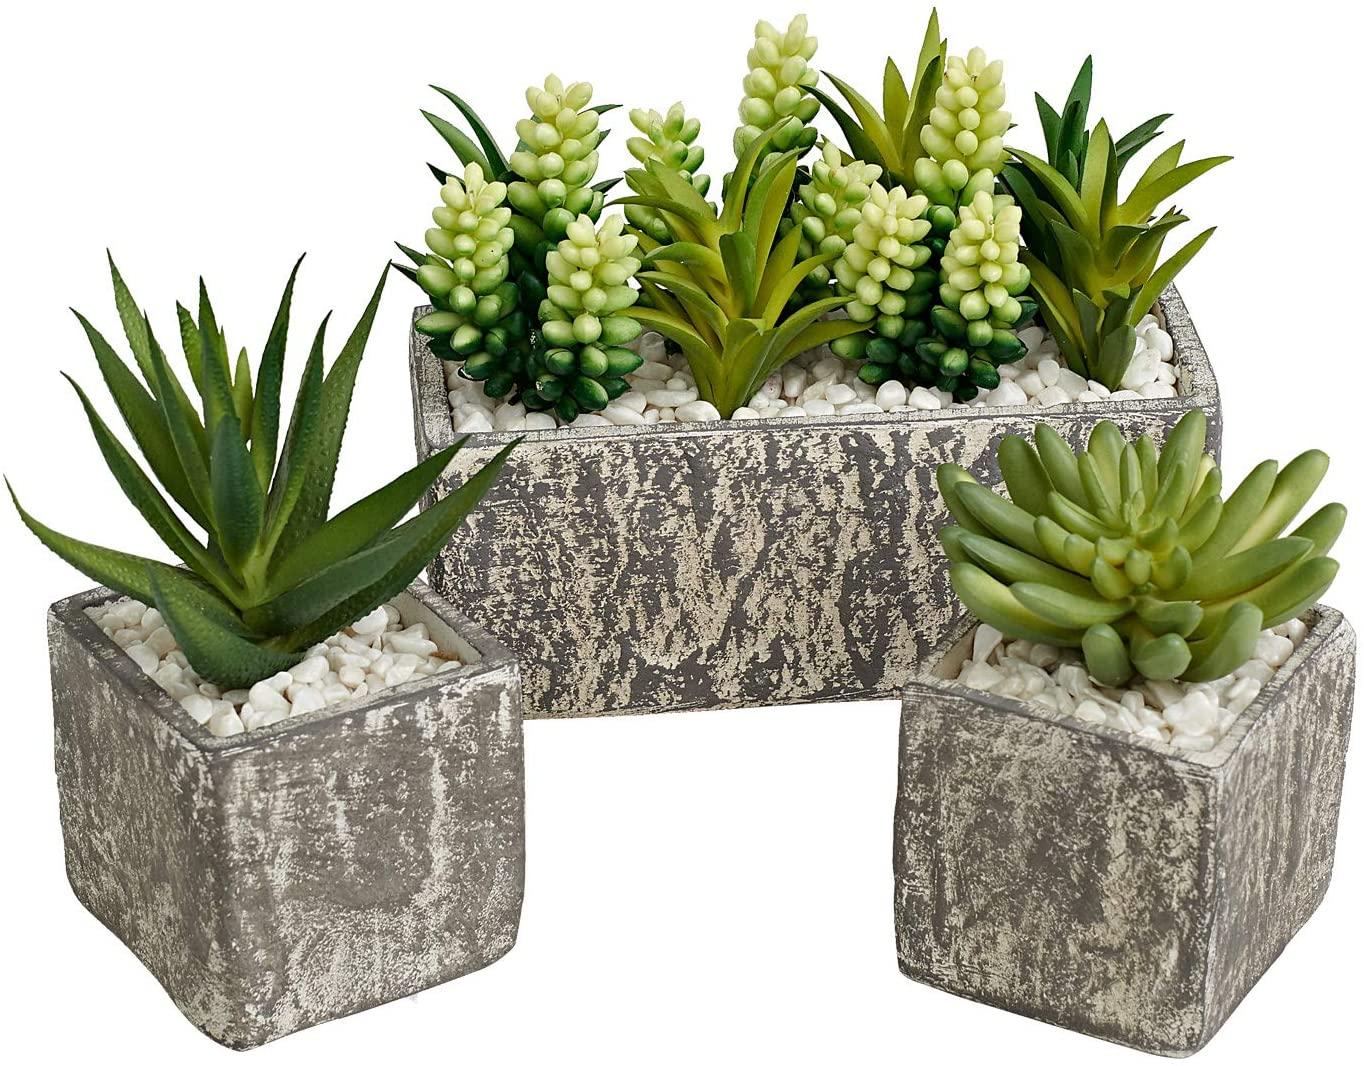 MOTINI Artificial Succulent Plants Box Fake Plant Set of 3 Faux Succulent Planter Artificial Plants Rectangular Planter in Pot Plant Decor